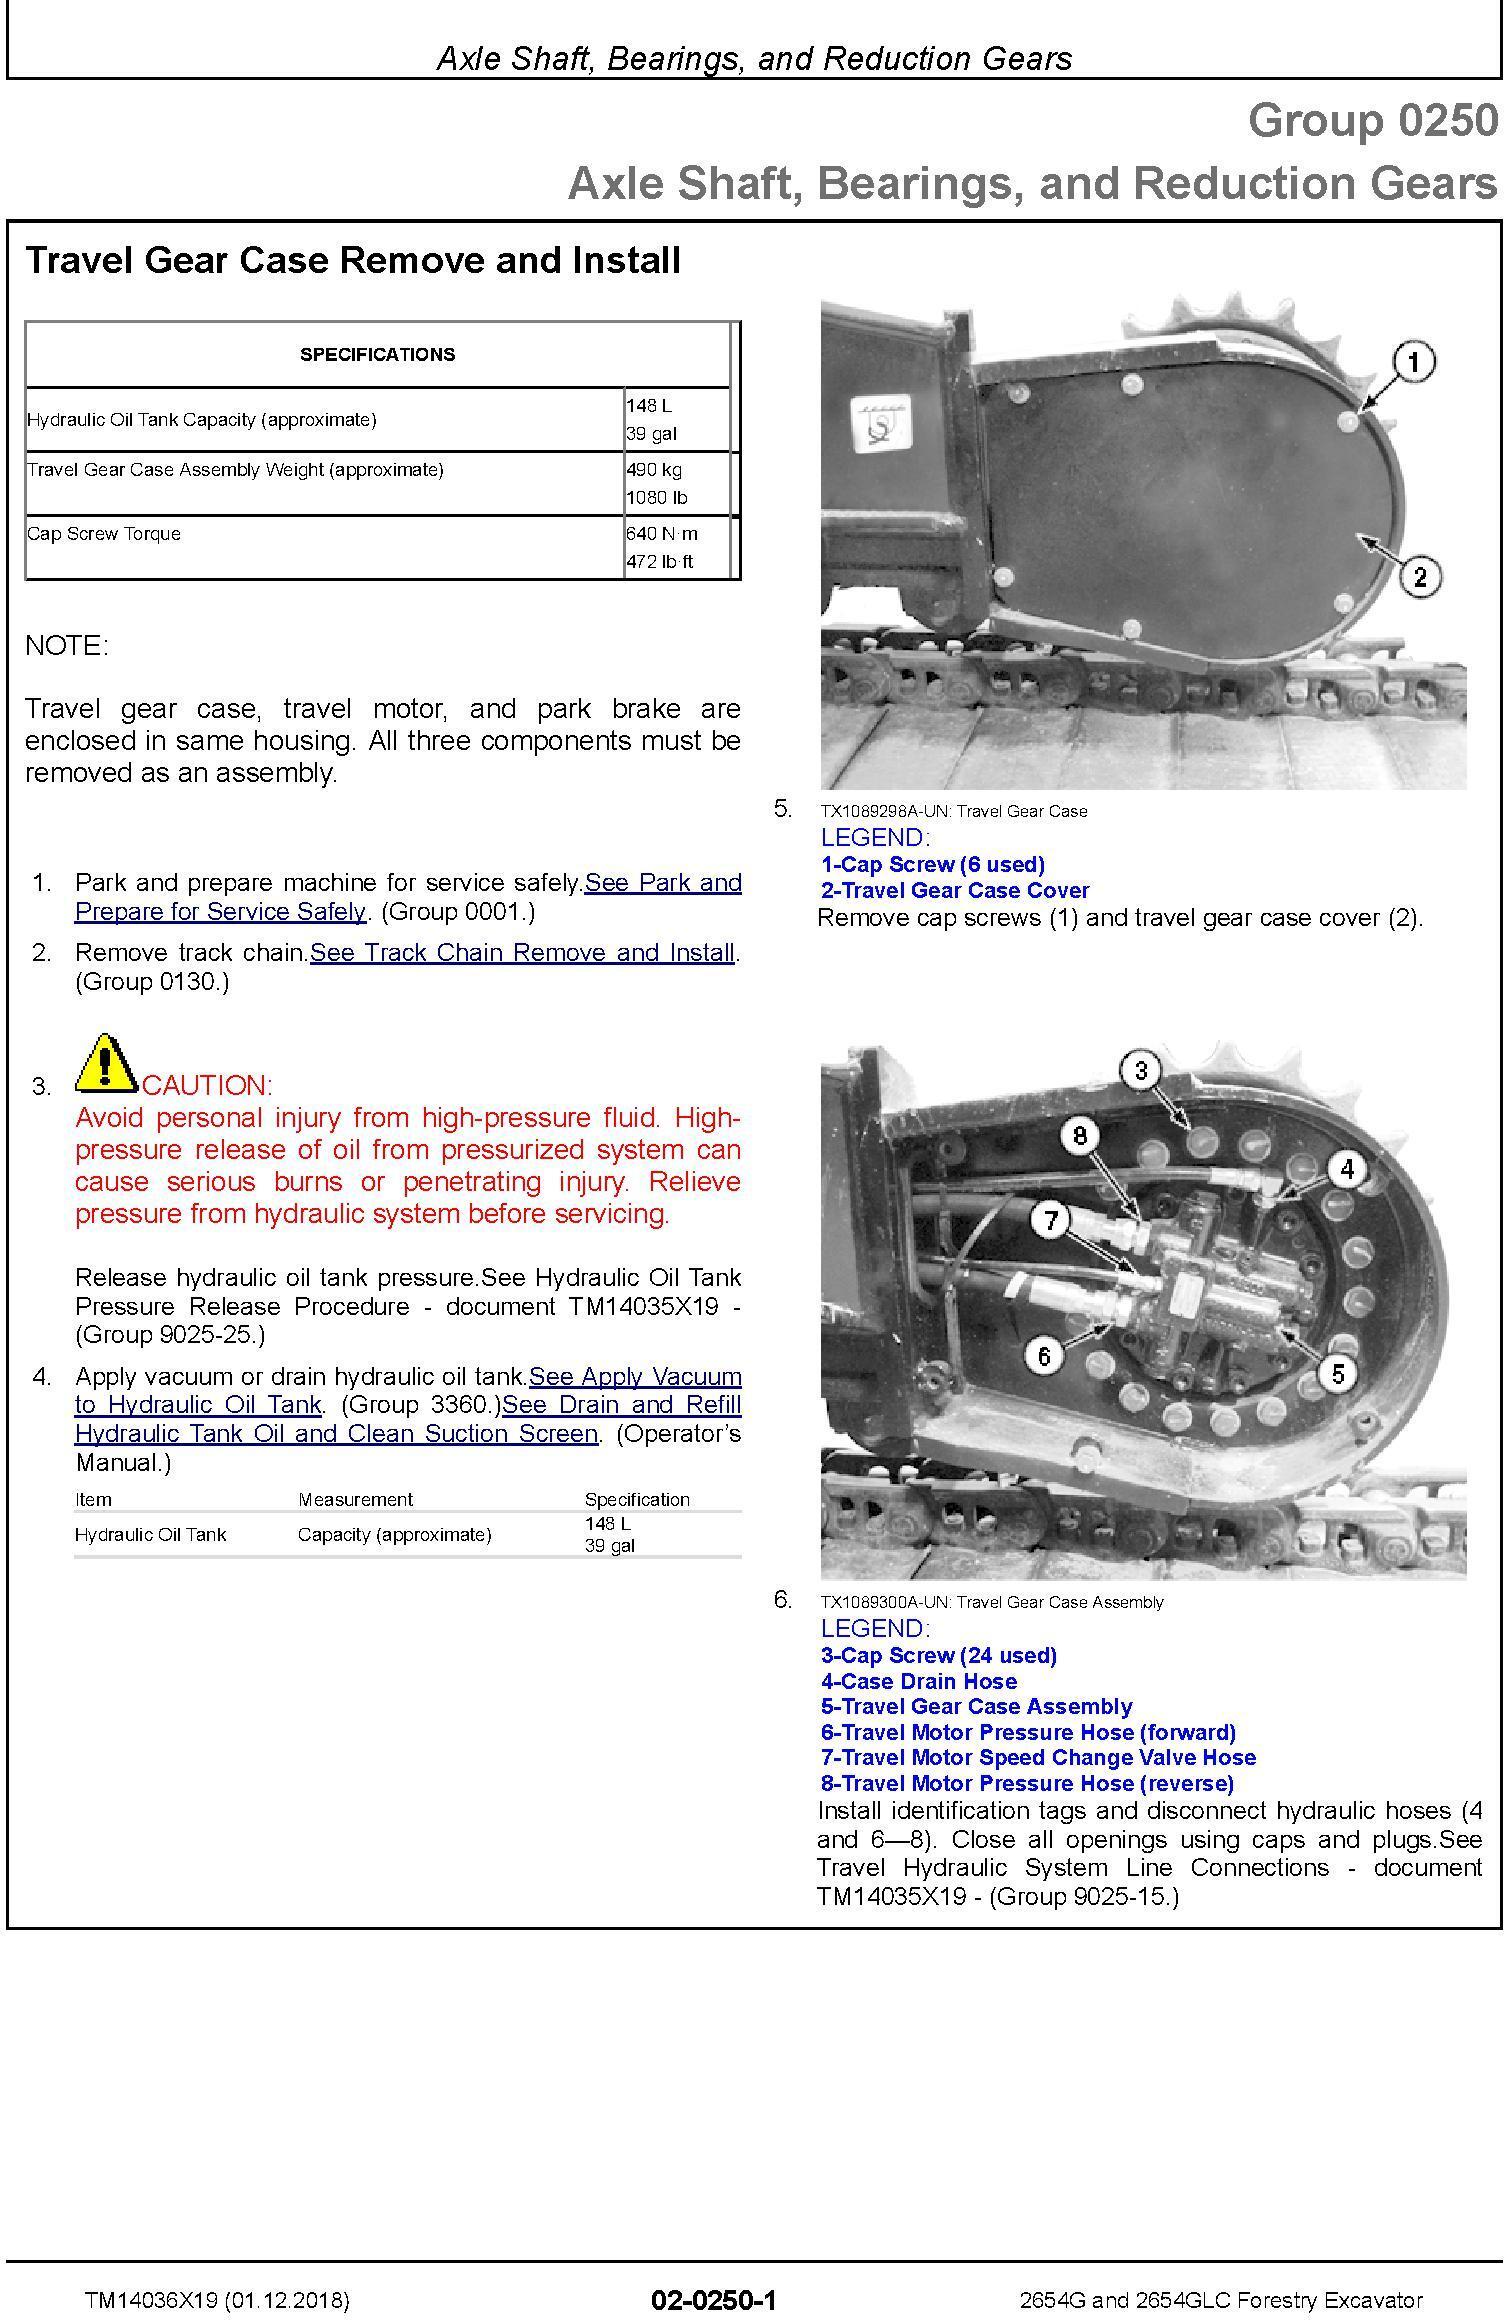 John Deere 2654G,2654GLC (SN.C260001-,D260001) Forestry Excavator Repair Service Manual (TM14036X19) - 2